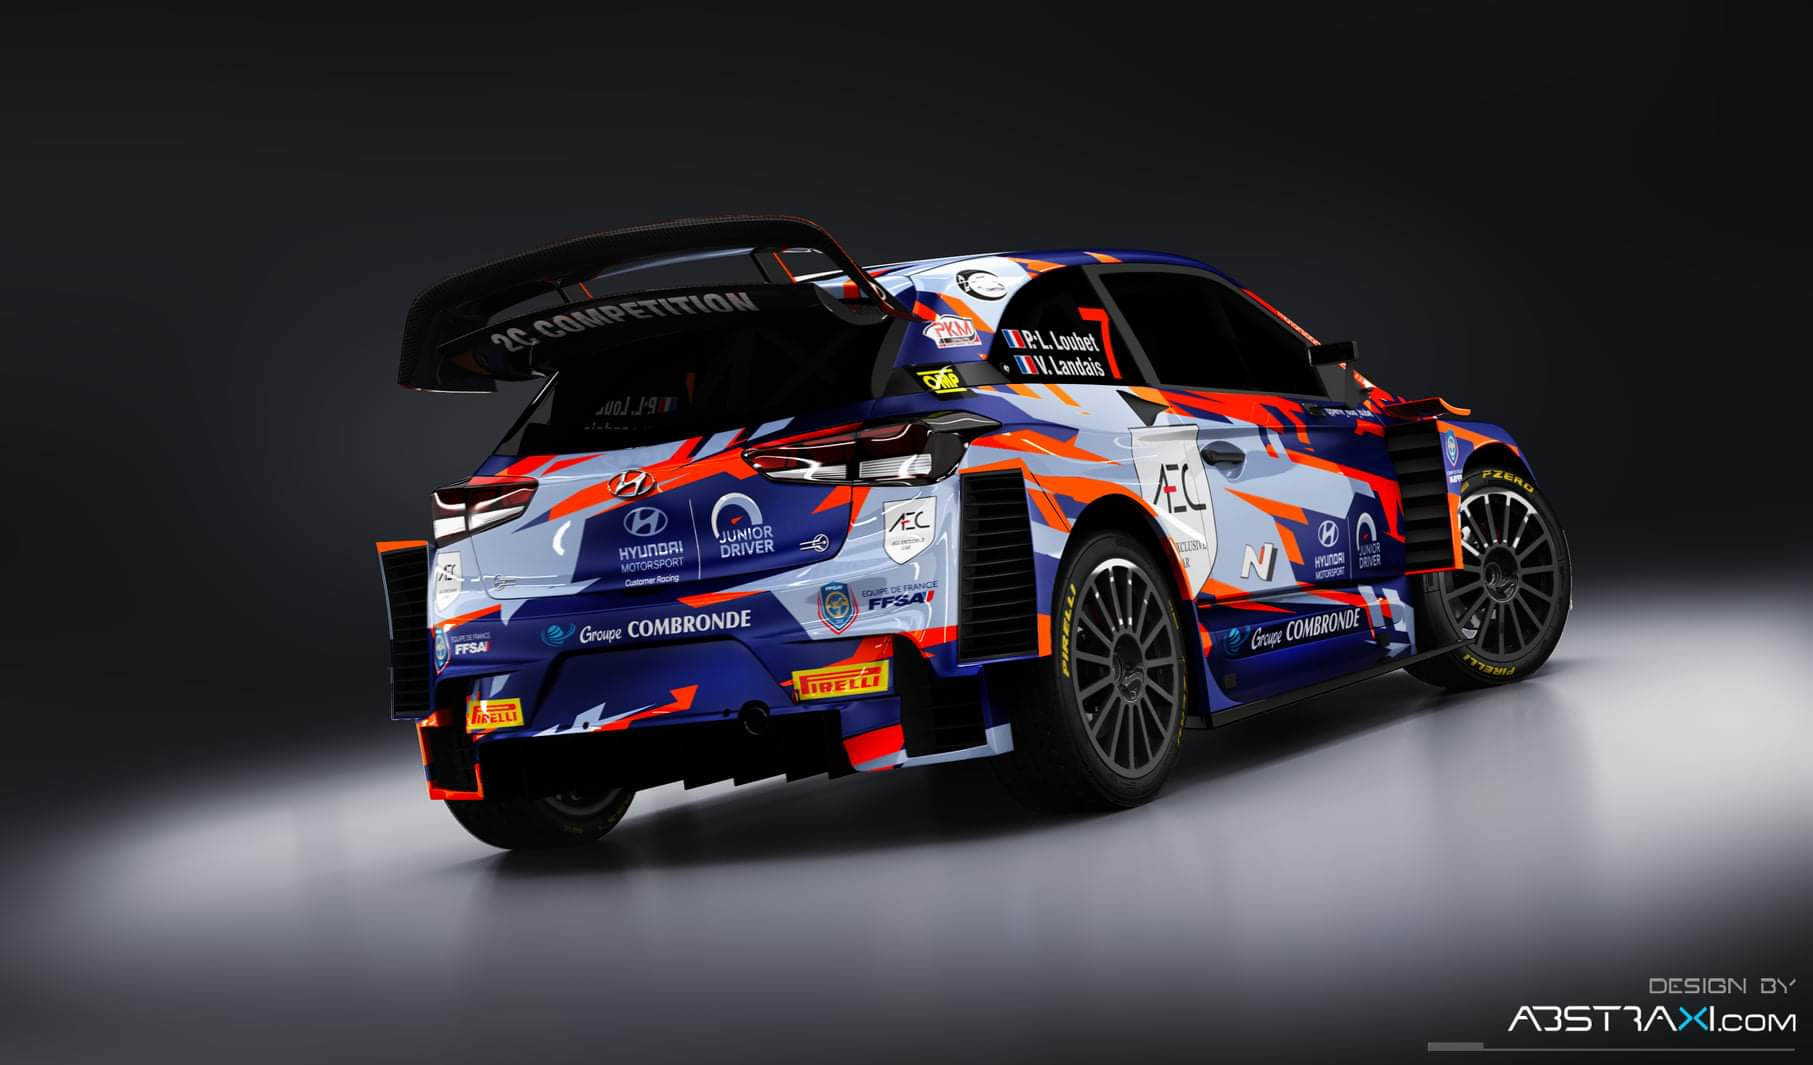 World Rally Championship: Temporada 2021  - Página 3 ErYyXgTXEAAHkZC?format=jpg&name=large